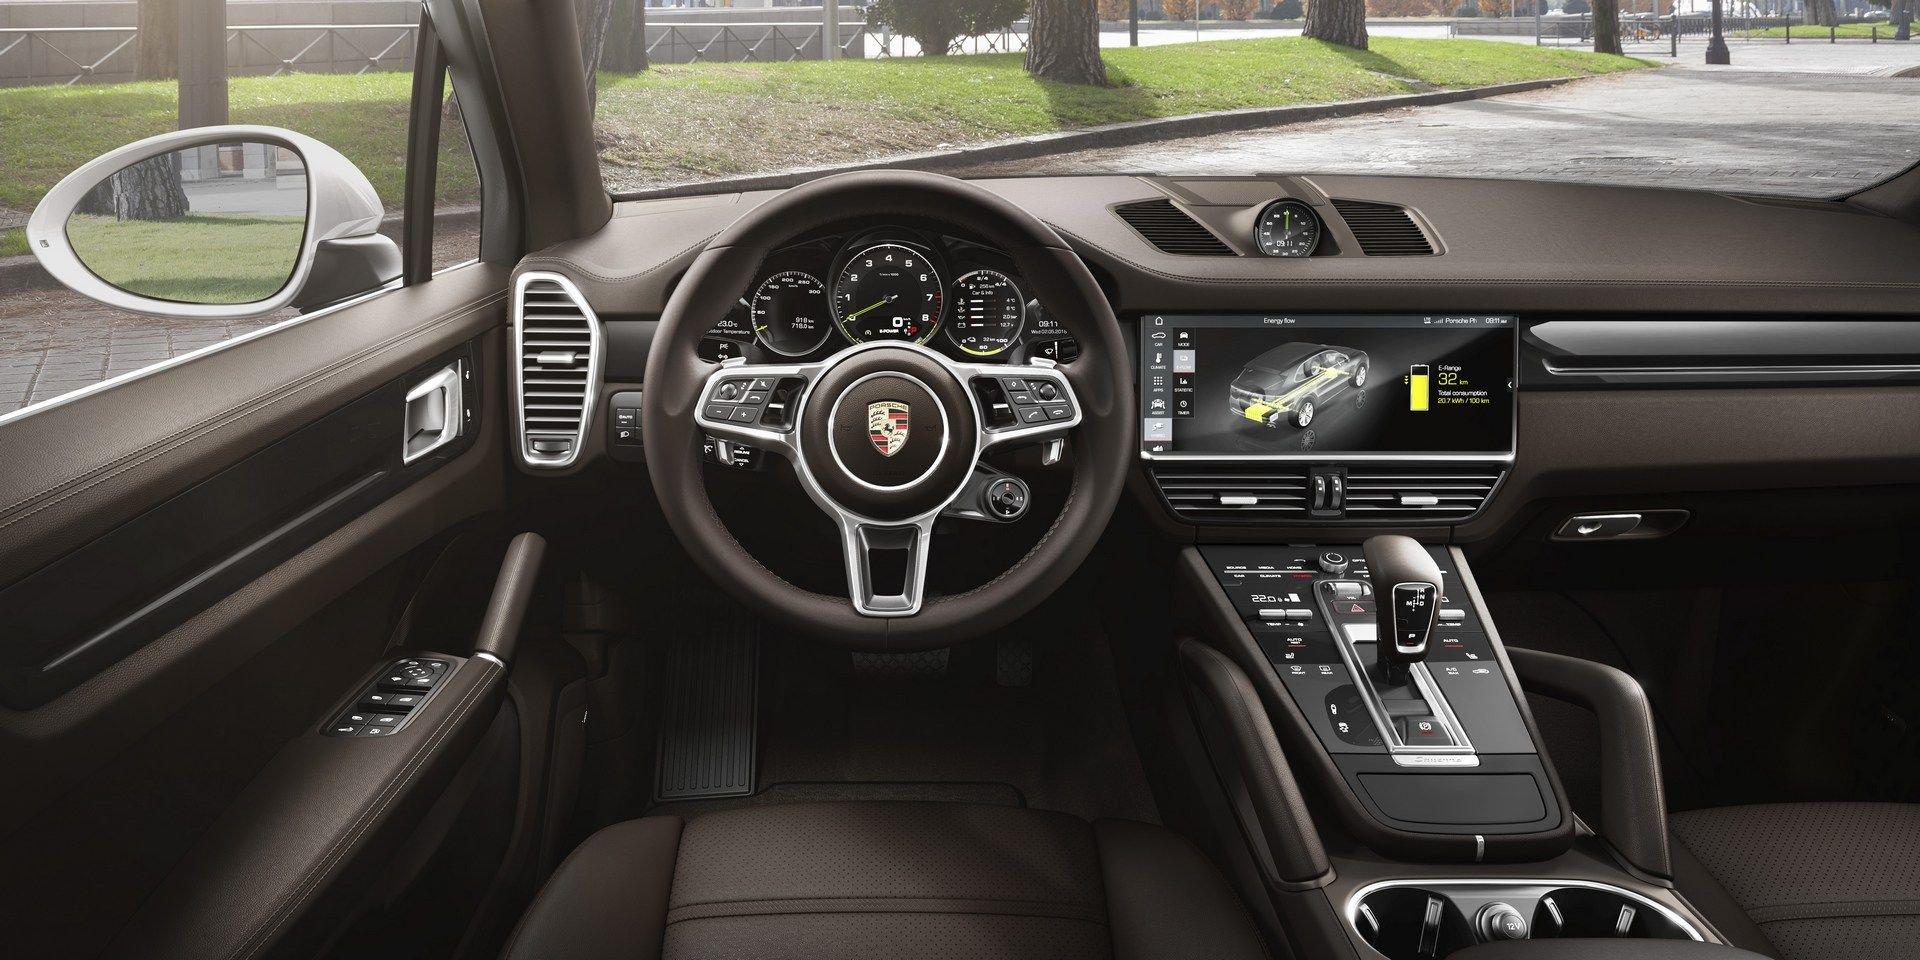 2019 porsche cayenne e hybrid has 462 hp sport chrono. Black Bedroom Furniture Sets. Home Design Ideas